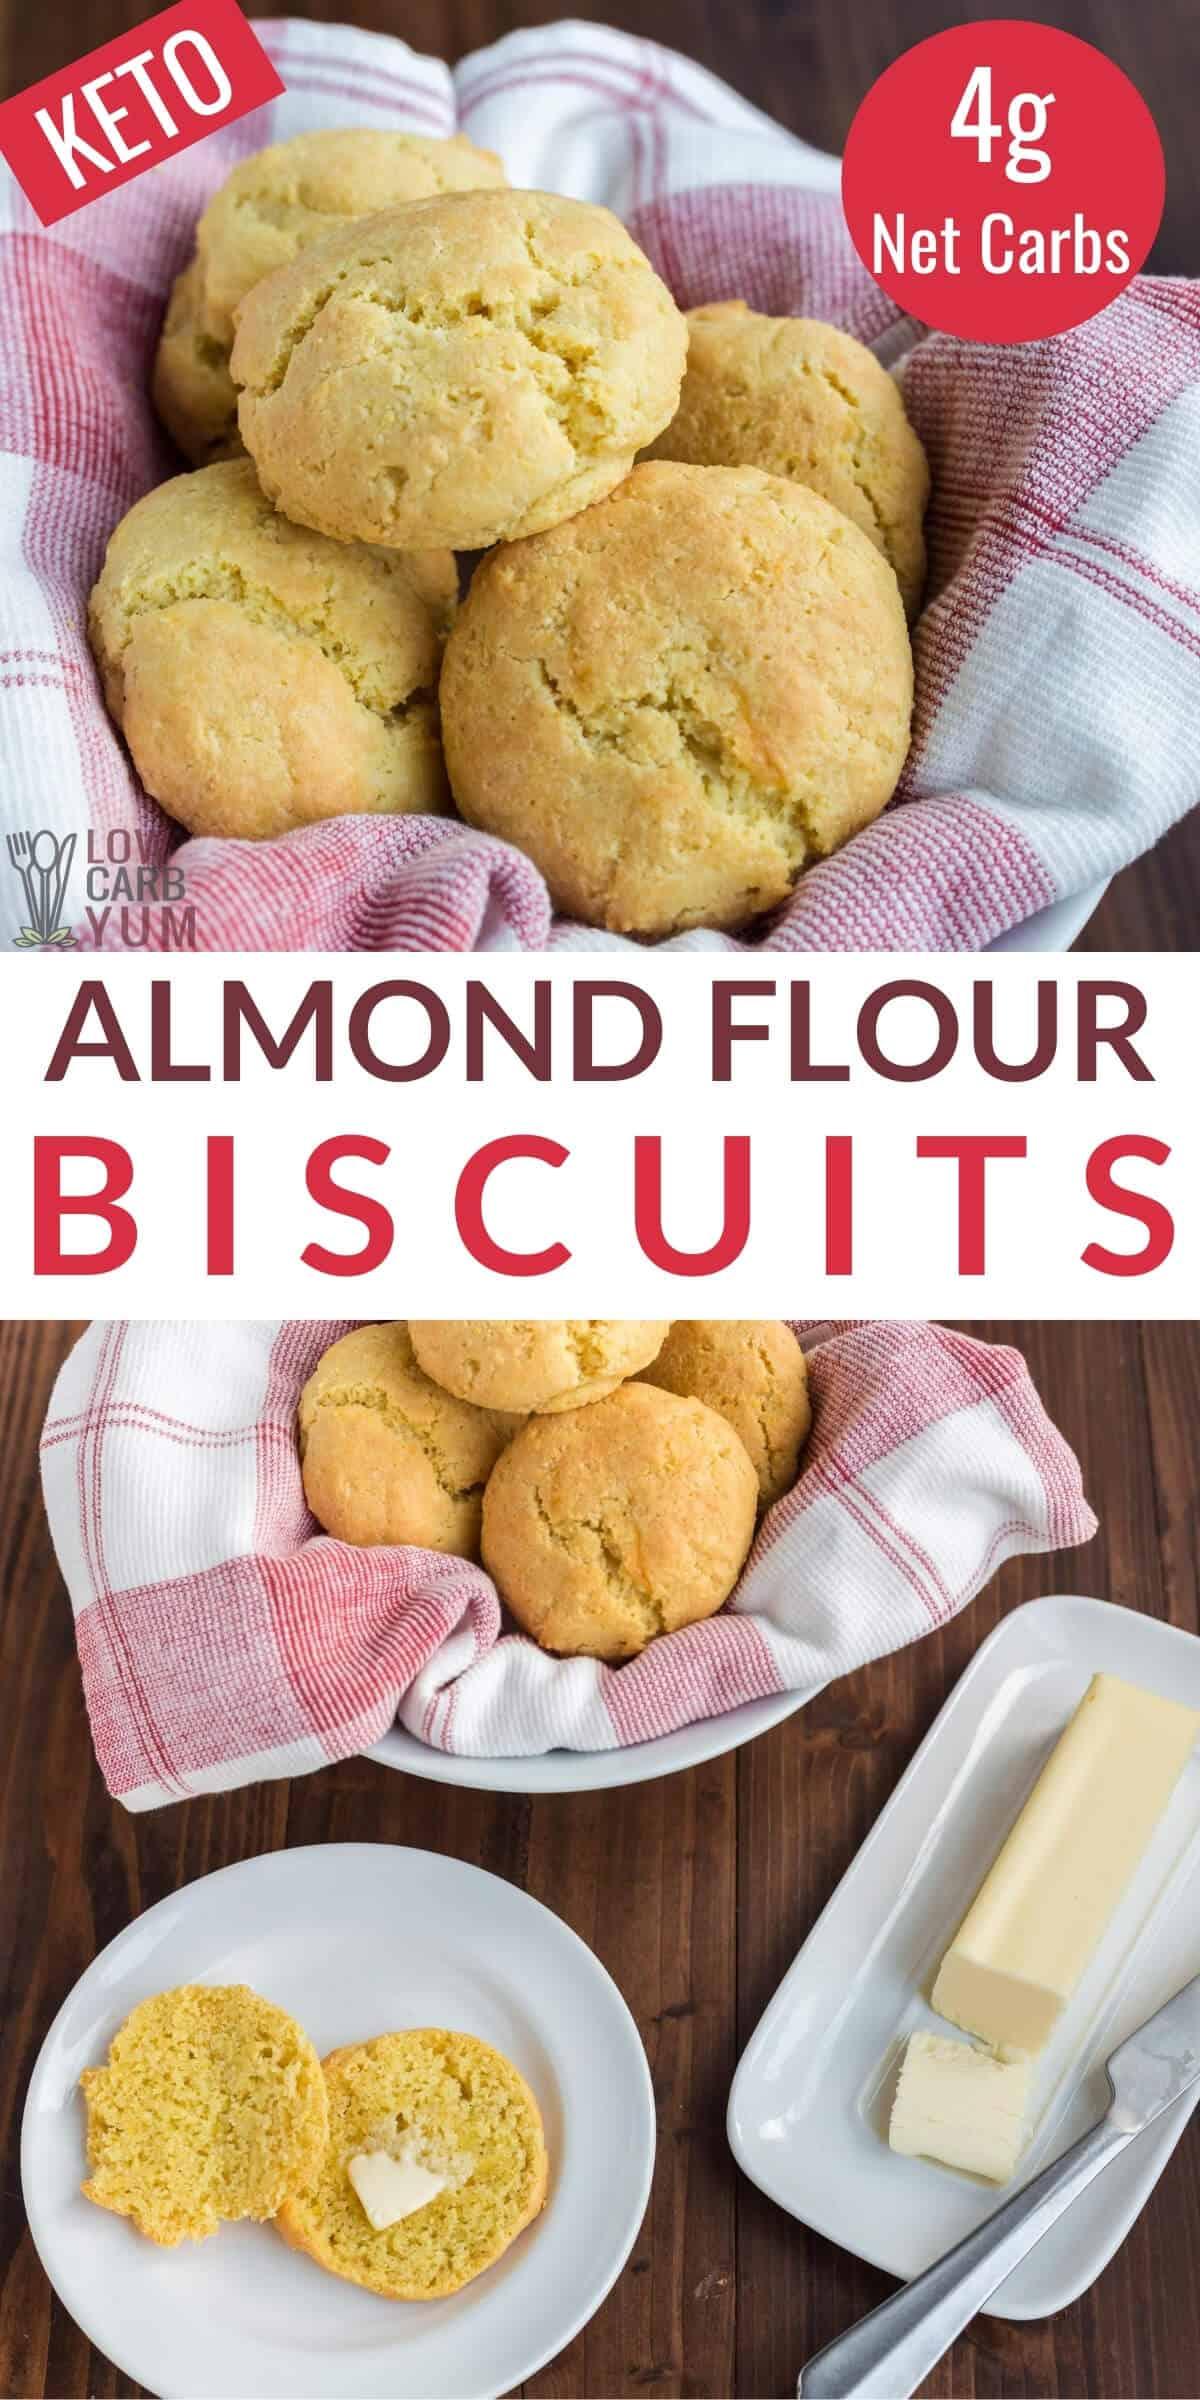 keto almond flour biscuits recipe